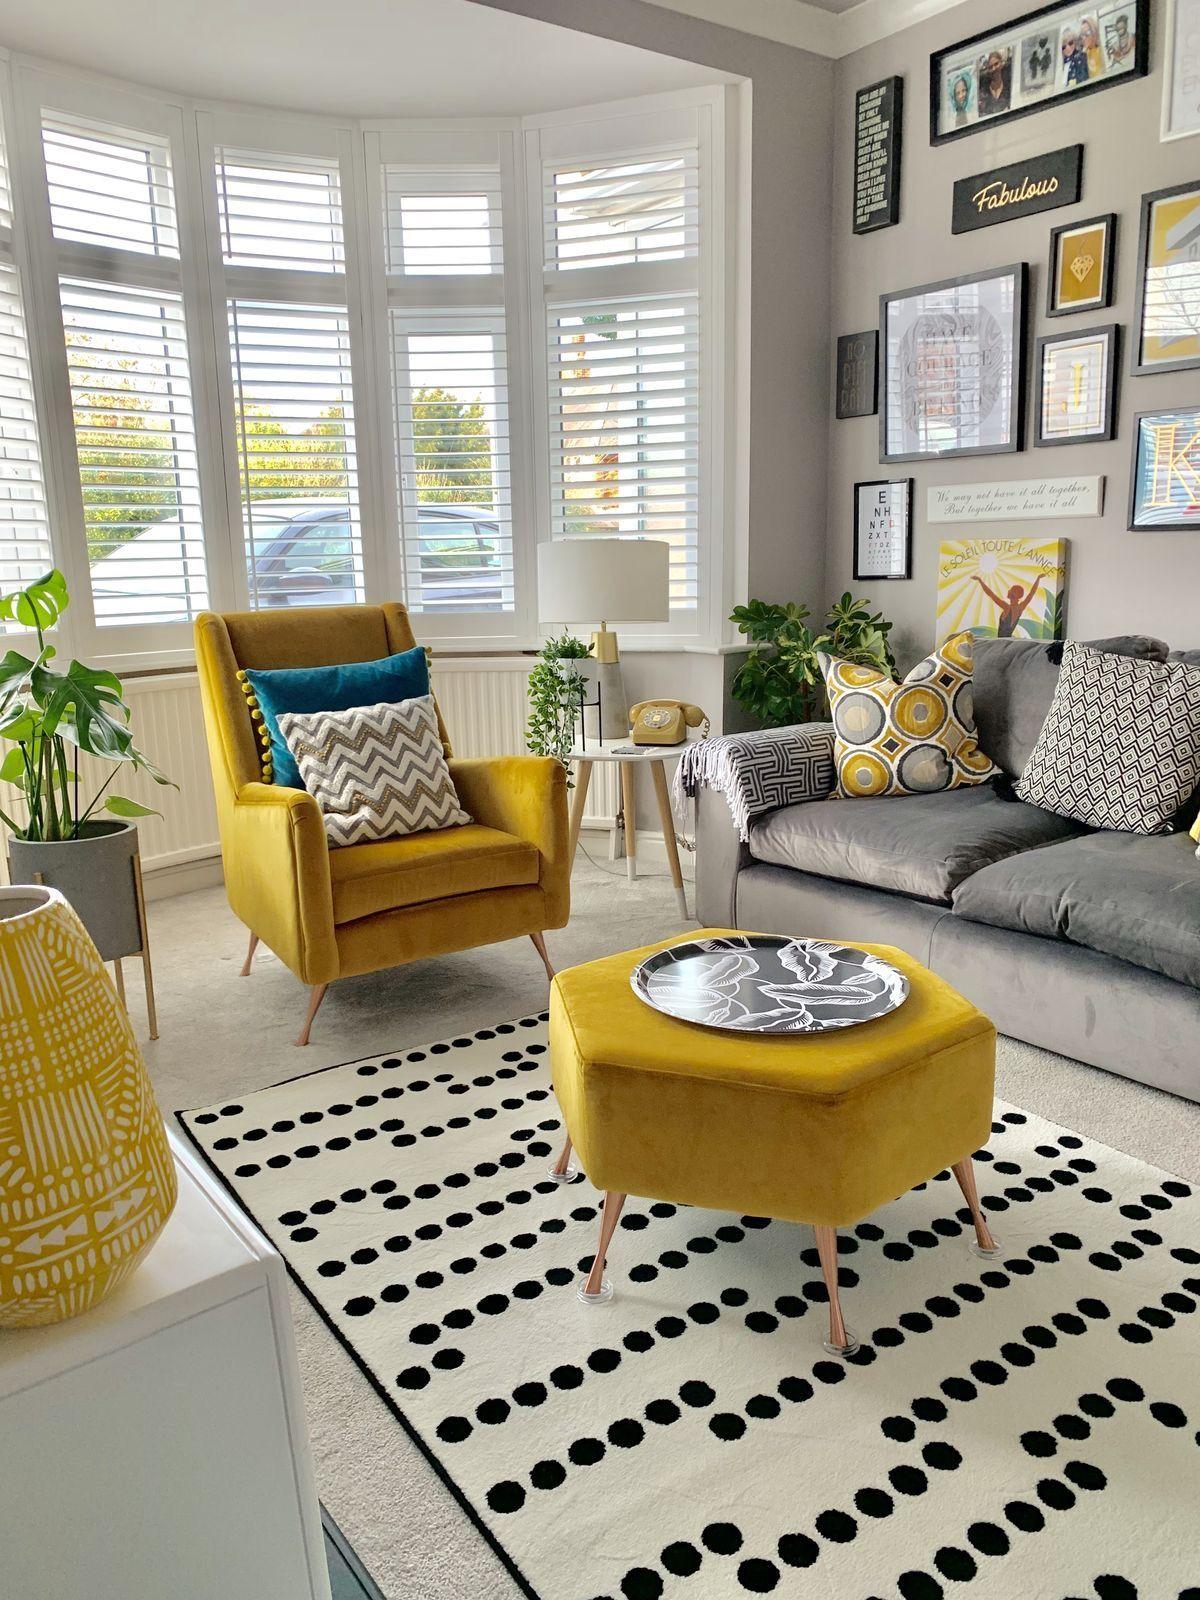 living room decor ideas remodeling inspiration house on living room color inspiration id=53452